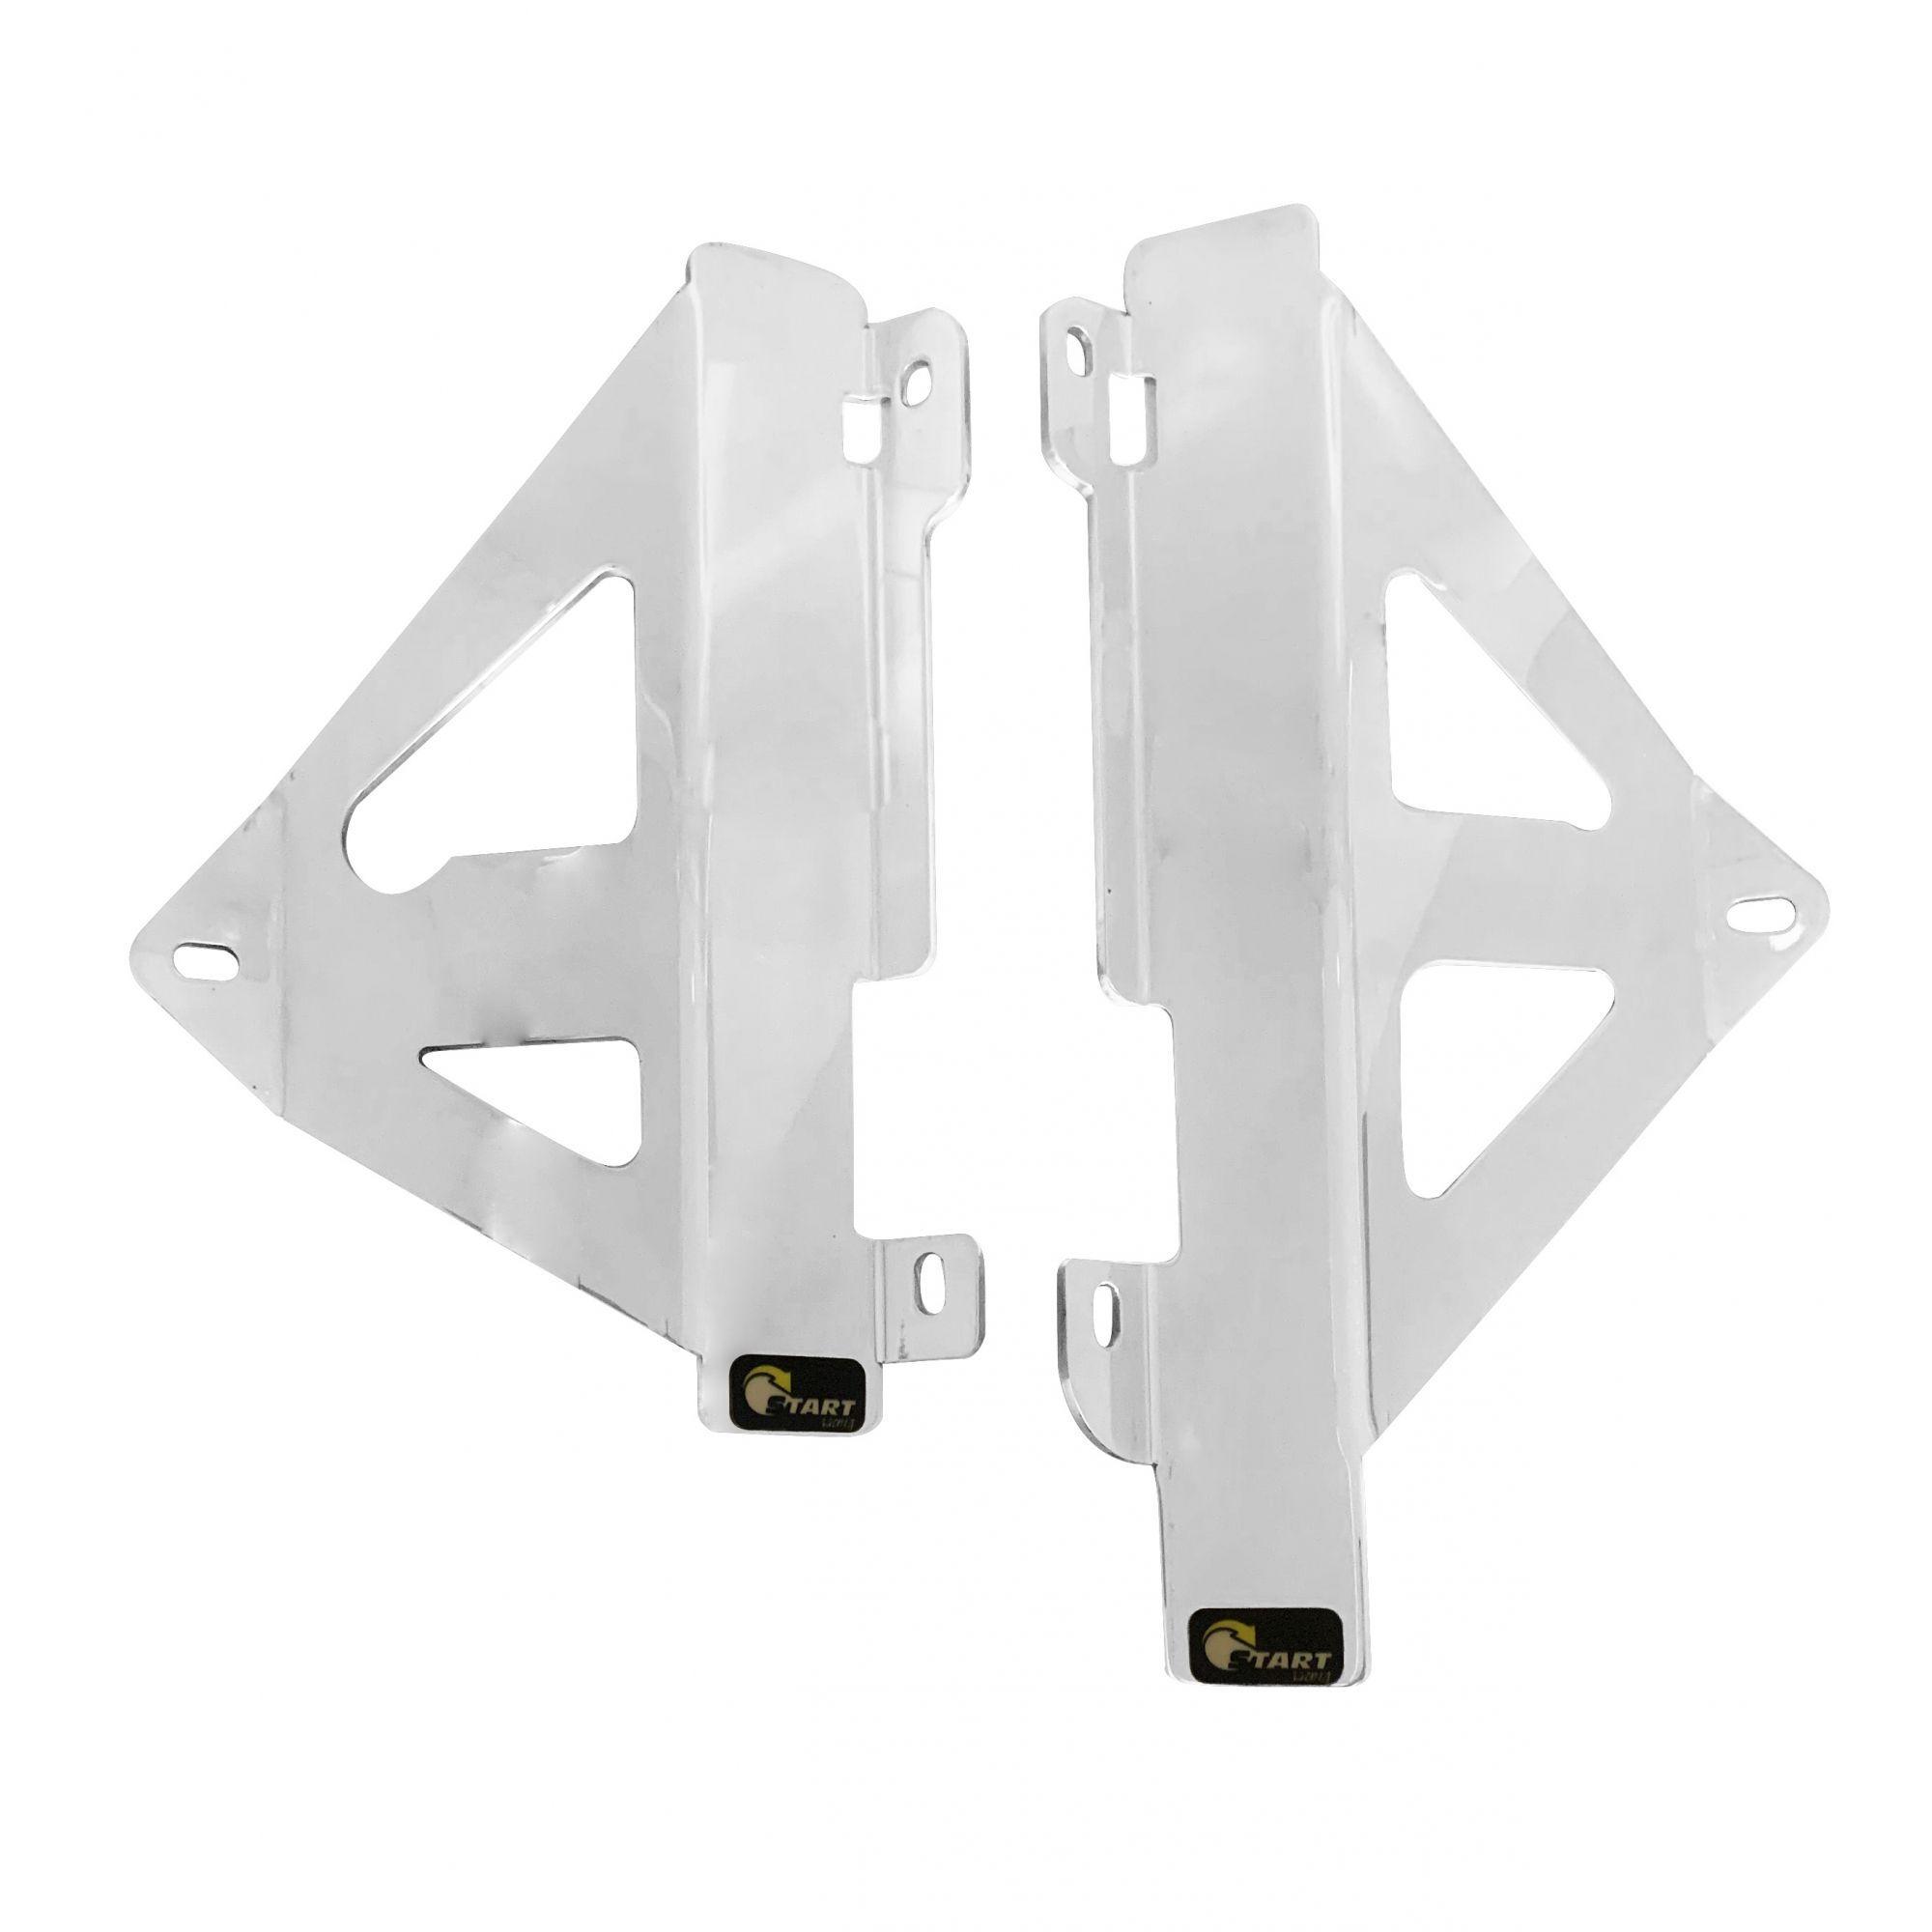 Protetor Radiador Start Mx Kxf 450 2010 a 2015